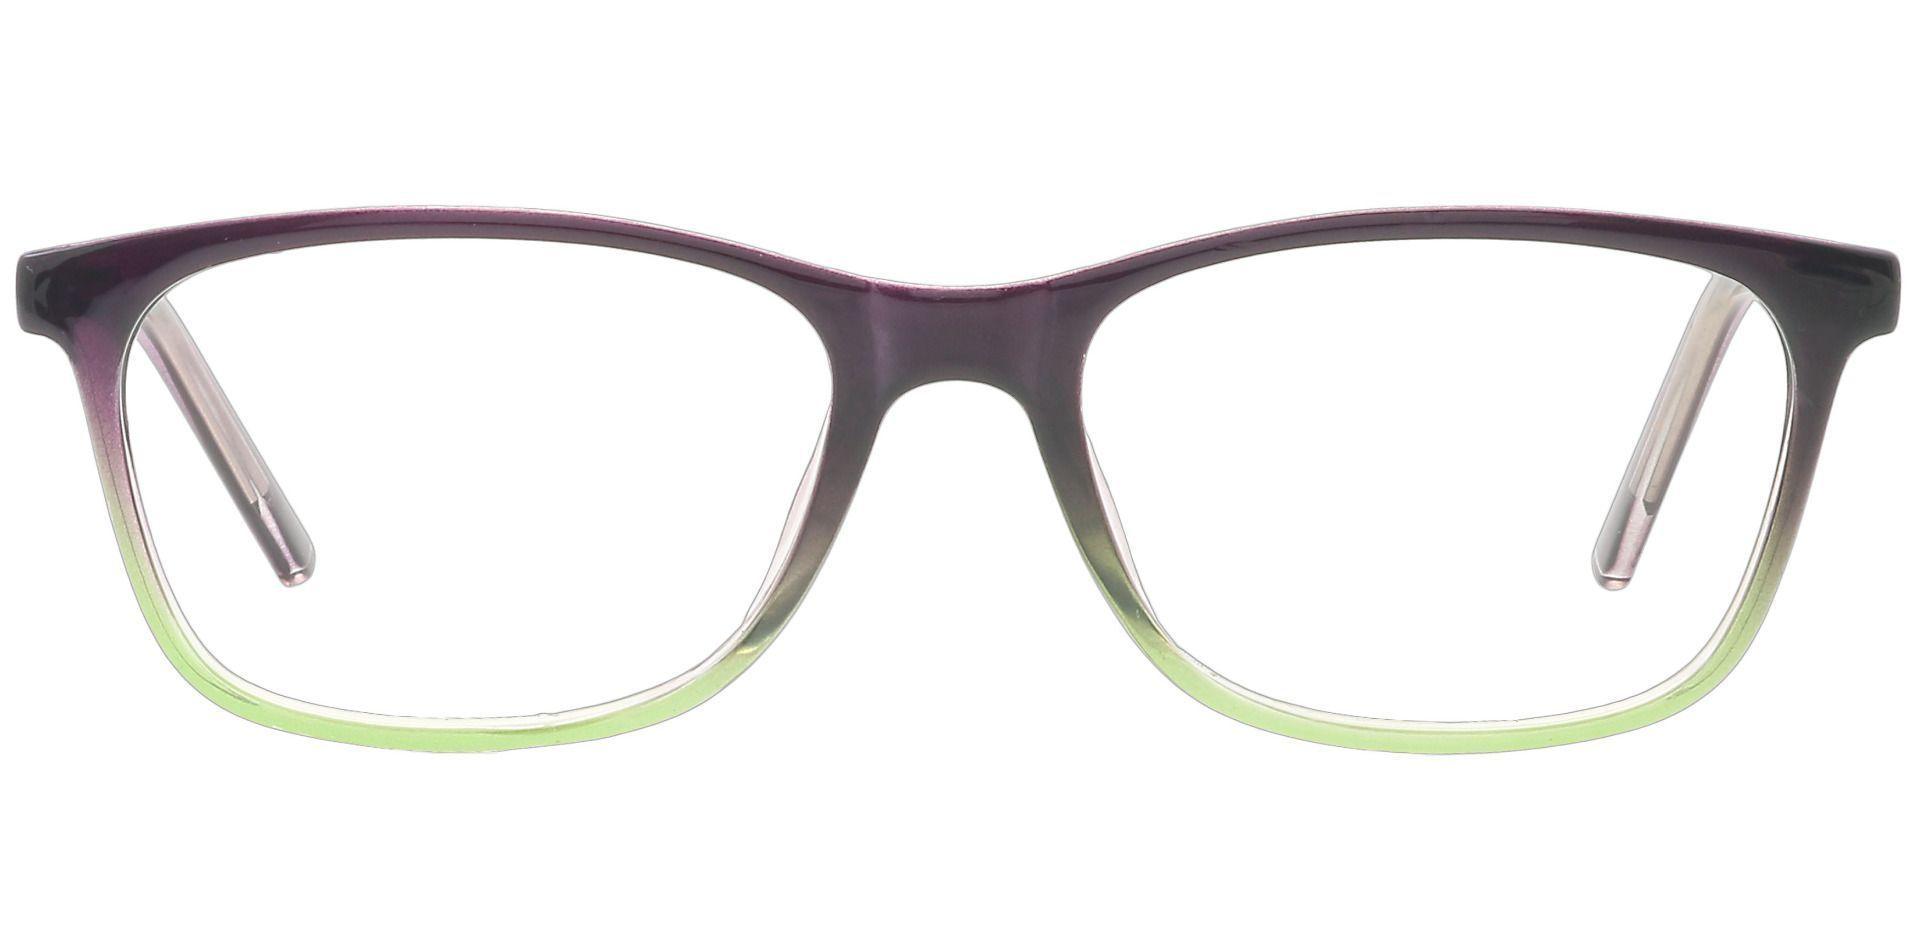 Safita Oval Lined Bifocal Glasses - Purple